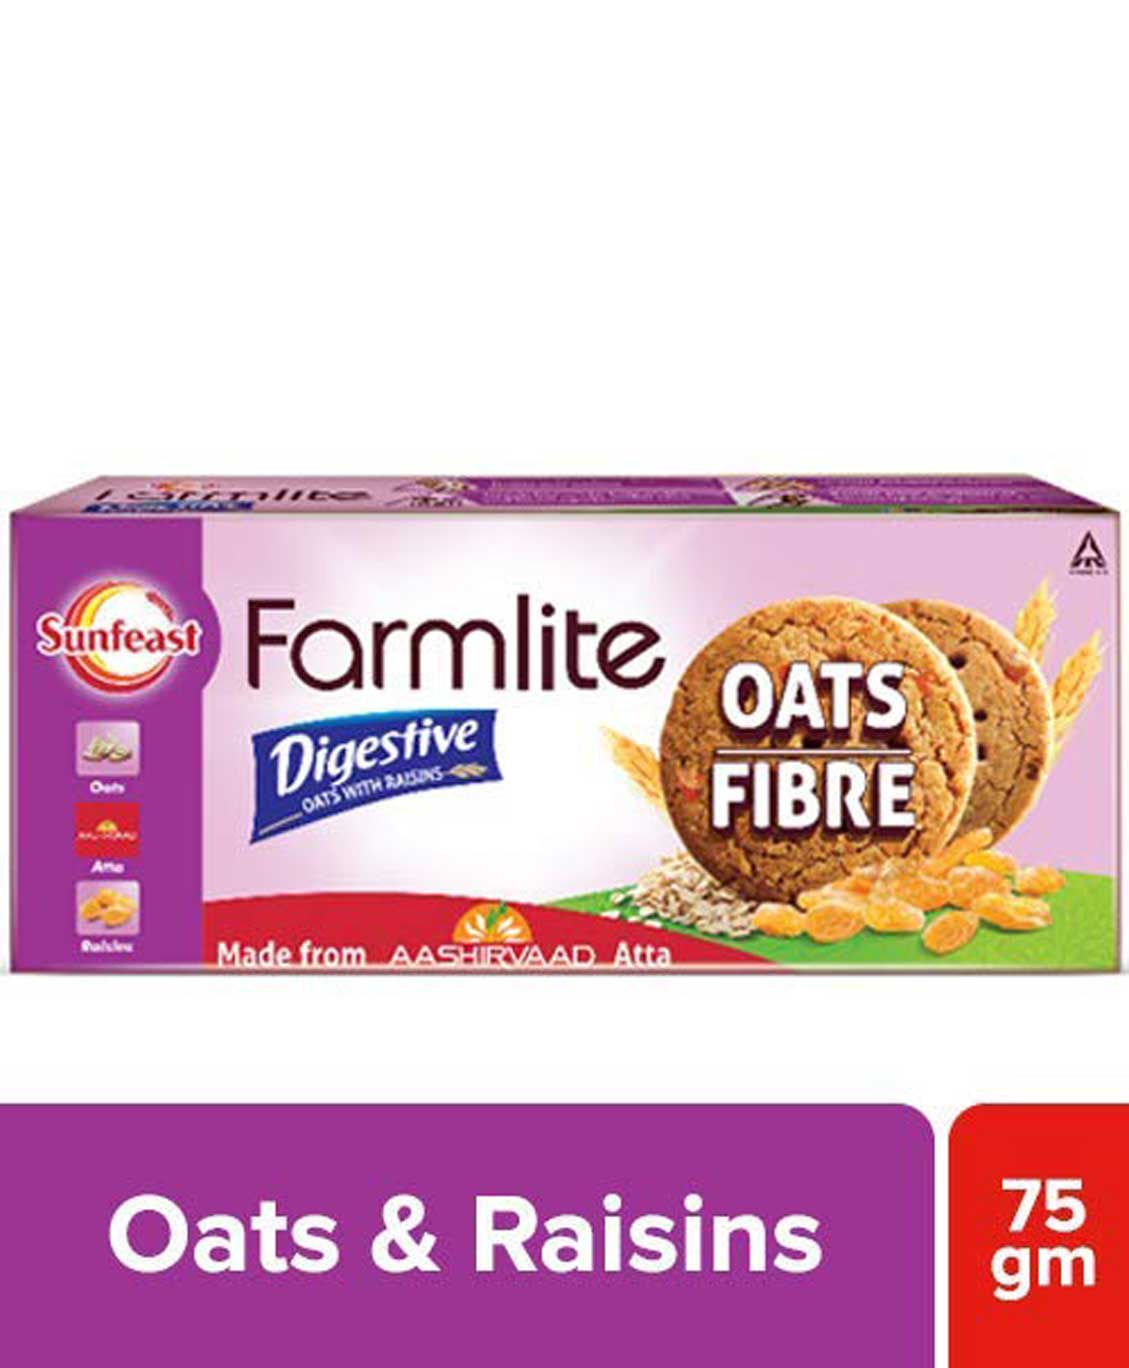 Sunfeast Farmlite Digestive Oats with Raisins Biscuits 75g